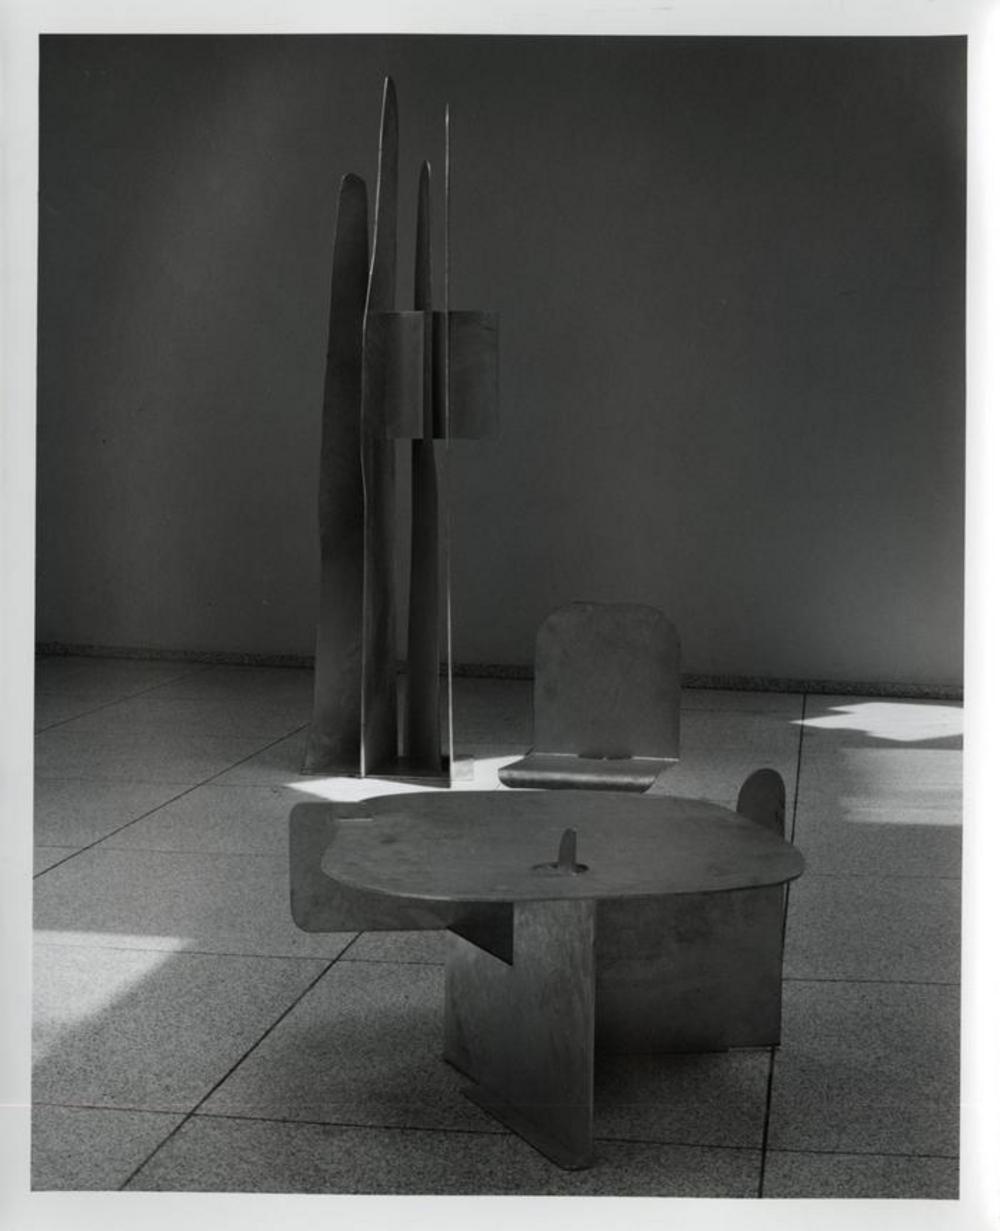 Pierced Seat, image 9